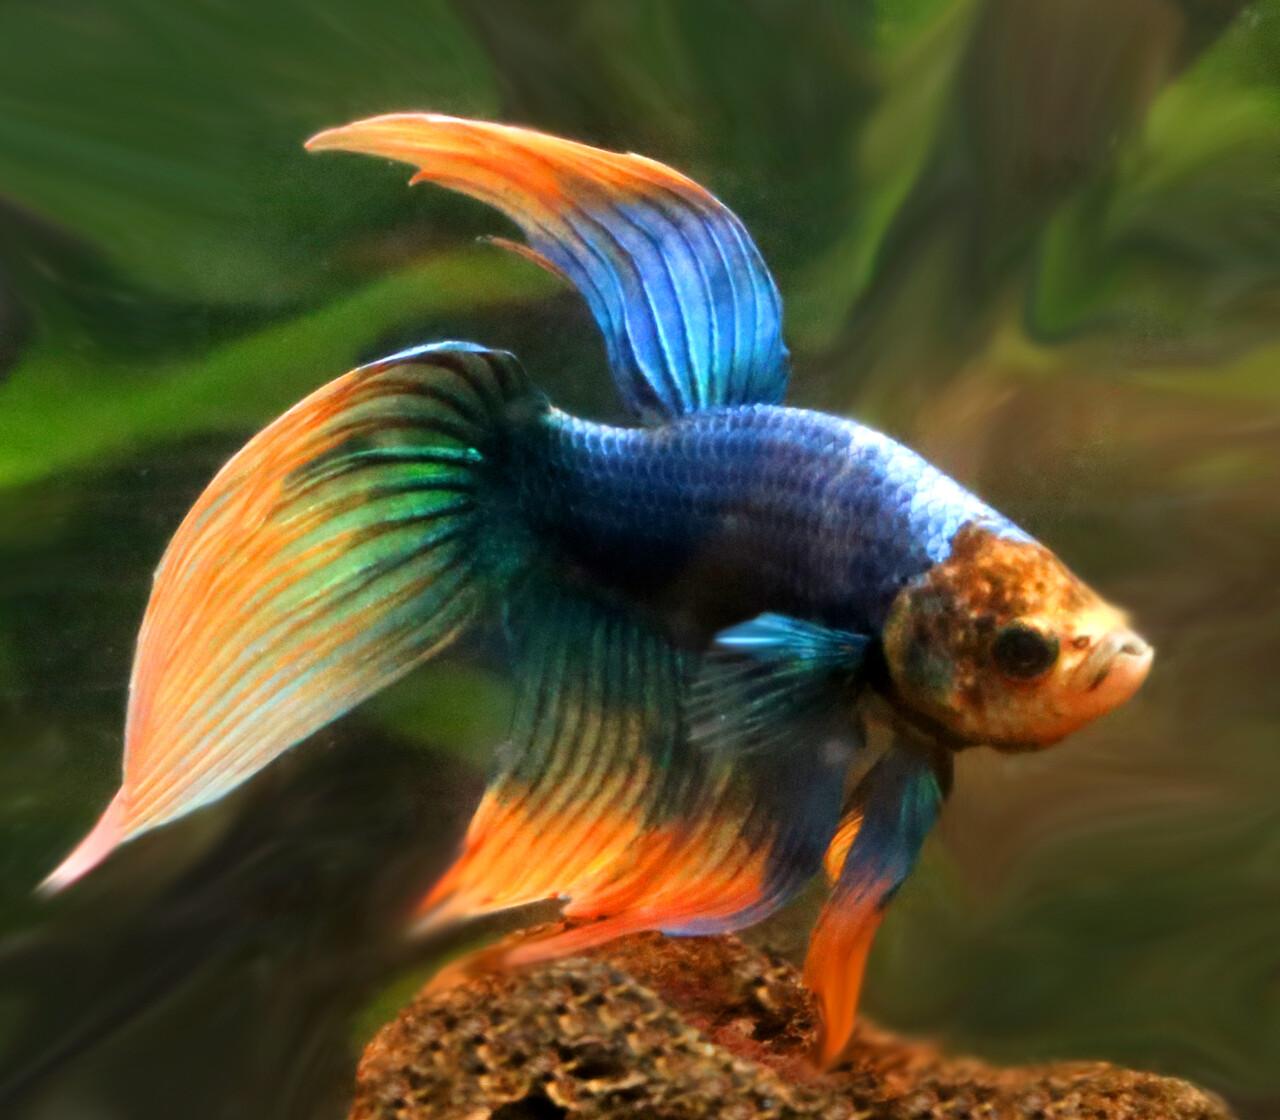 Premium WYSIWYG, MALE Unique Betta Fish